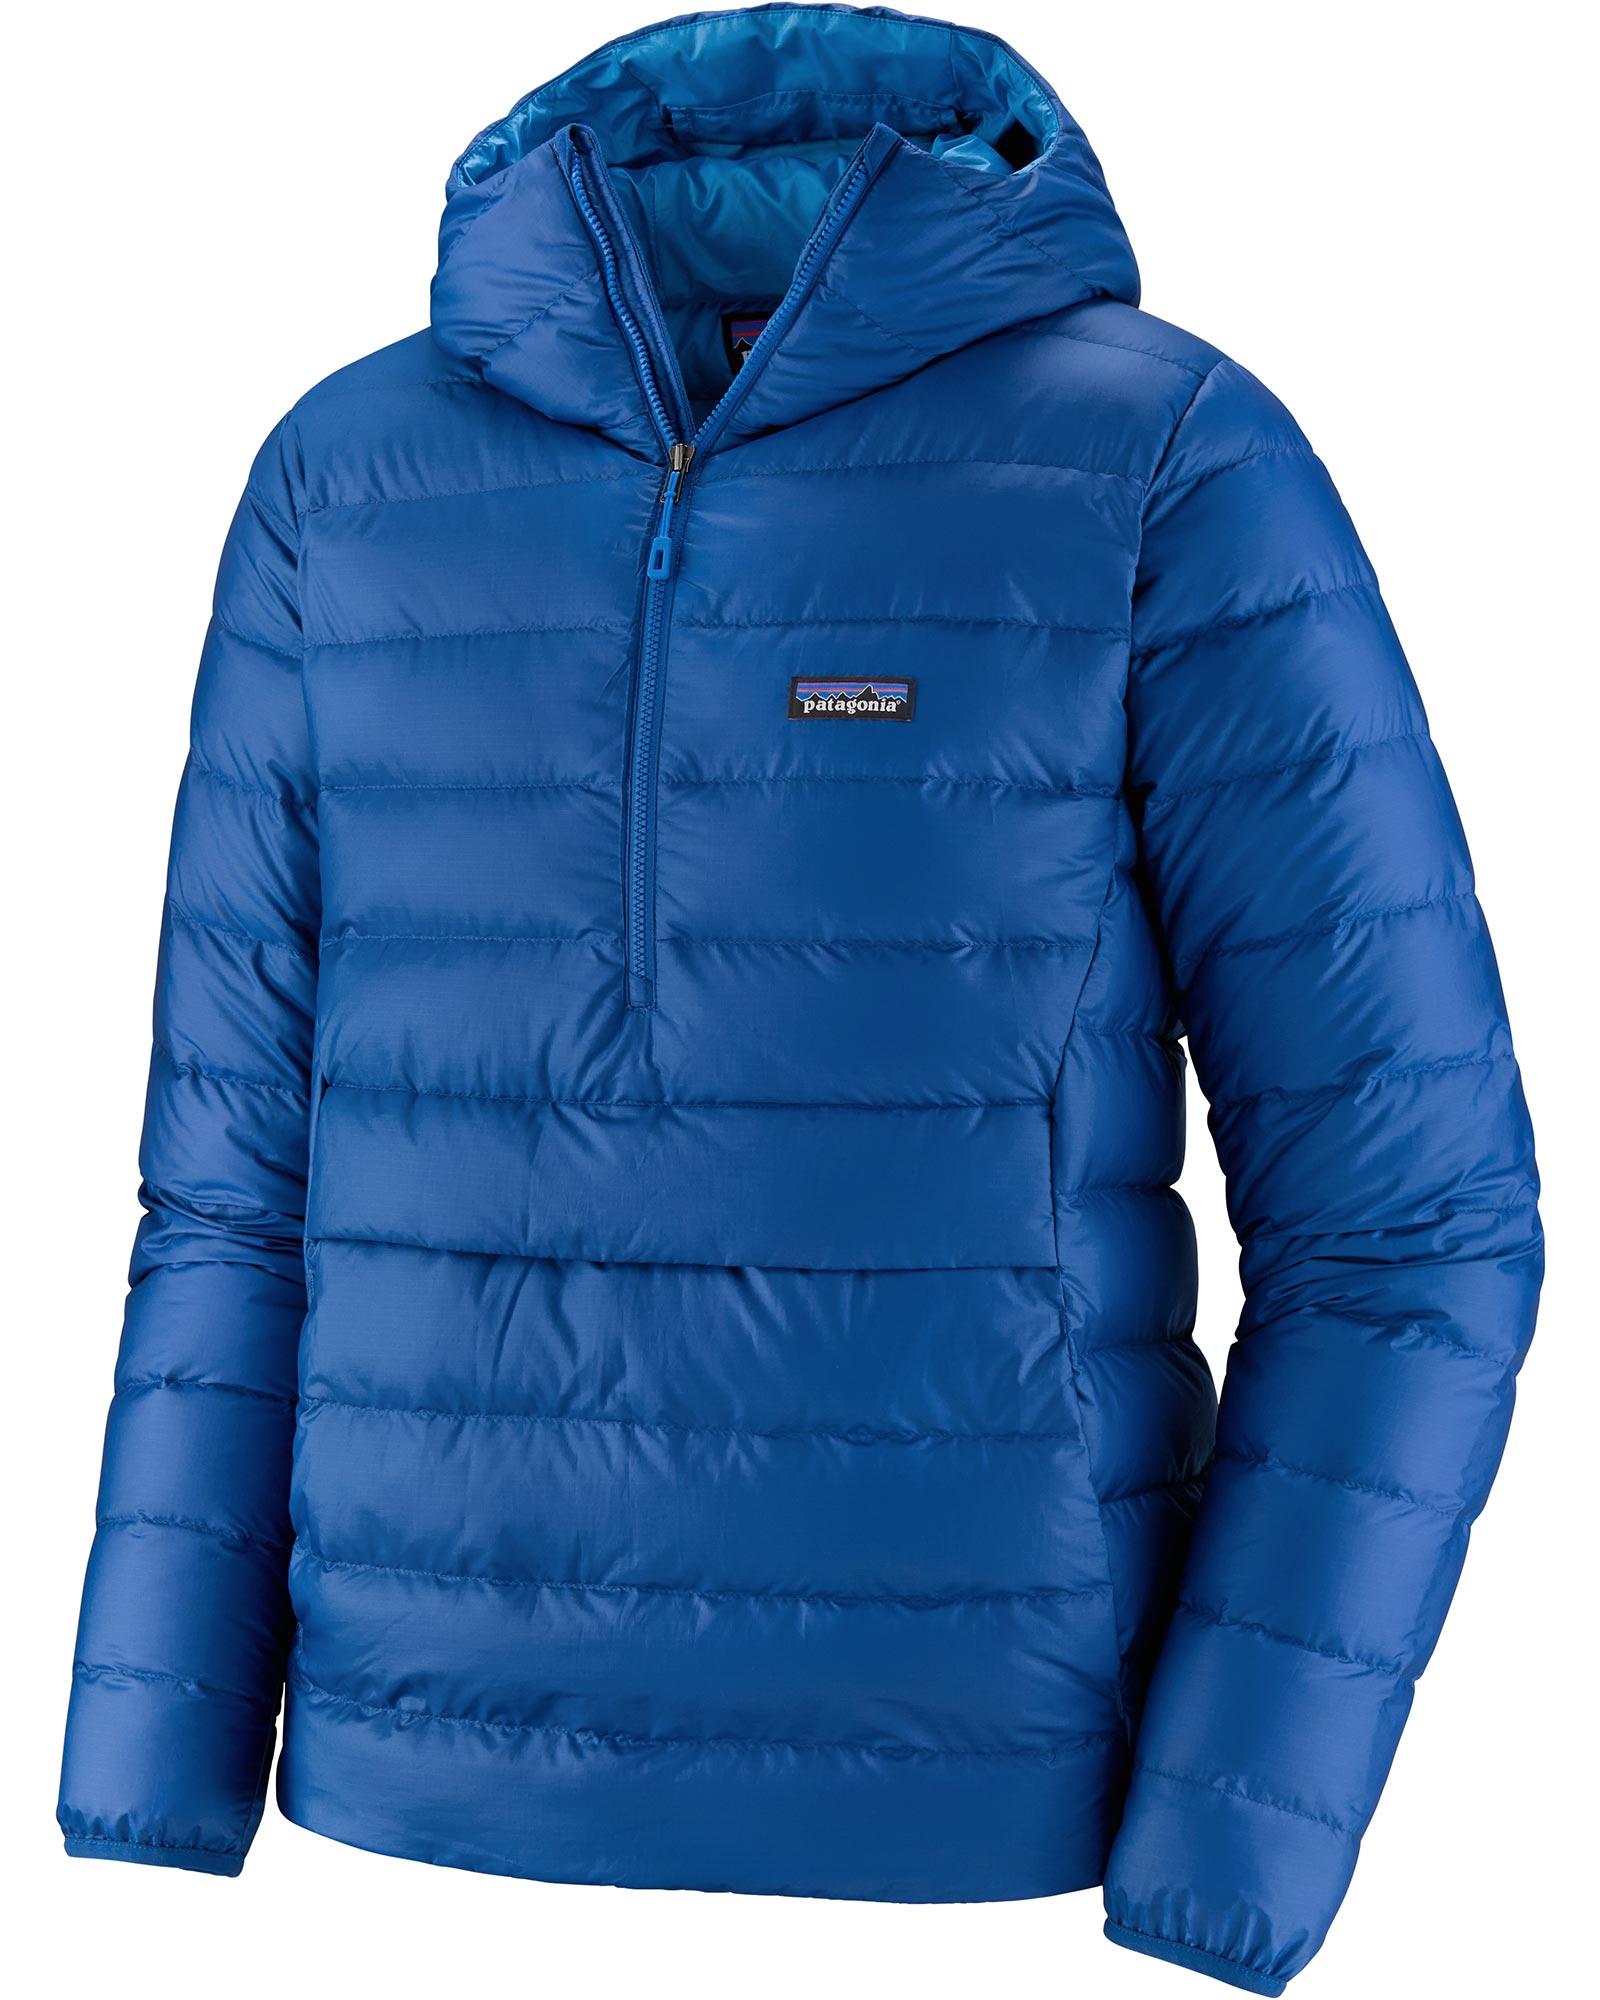 Patagonia Down Sweater Hoody Men's Pullover 0